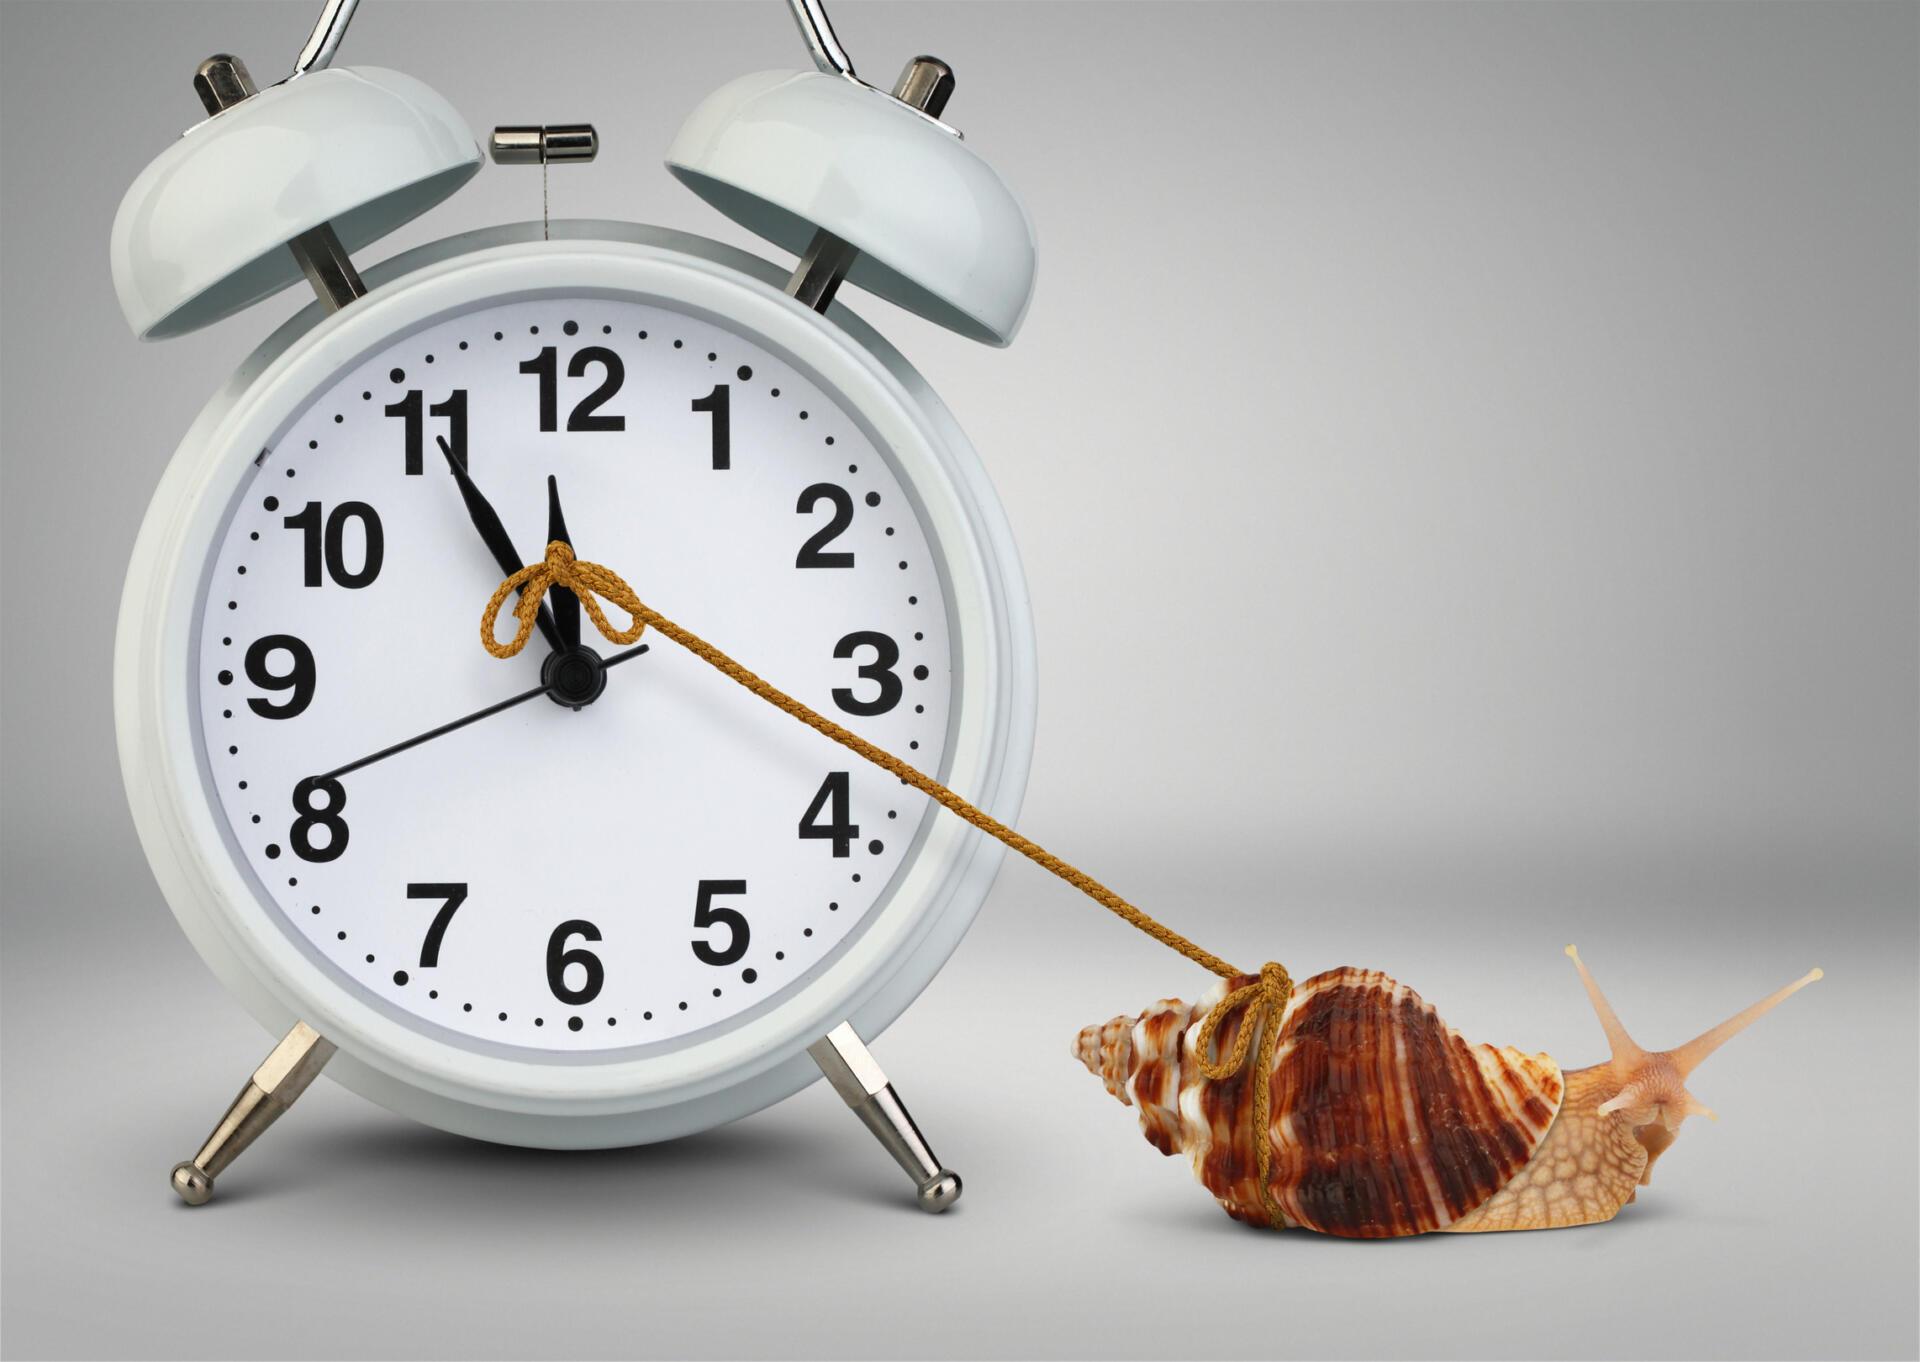 [On-line interaktivna delavnica] V praksi učinkovit »TIME MANAGEMENT« – uspešno dosezite zastavljene cilje